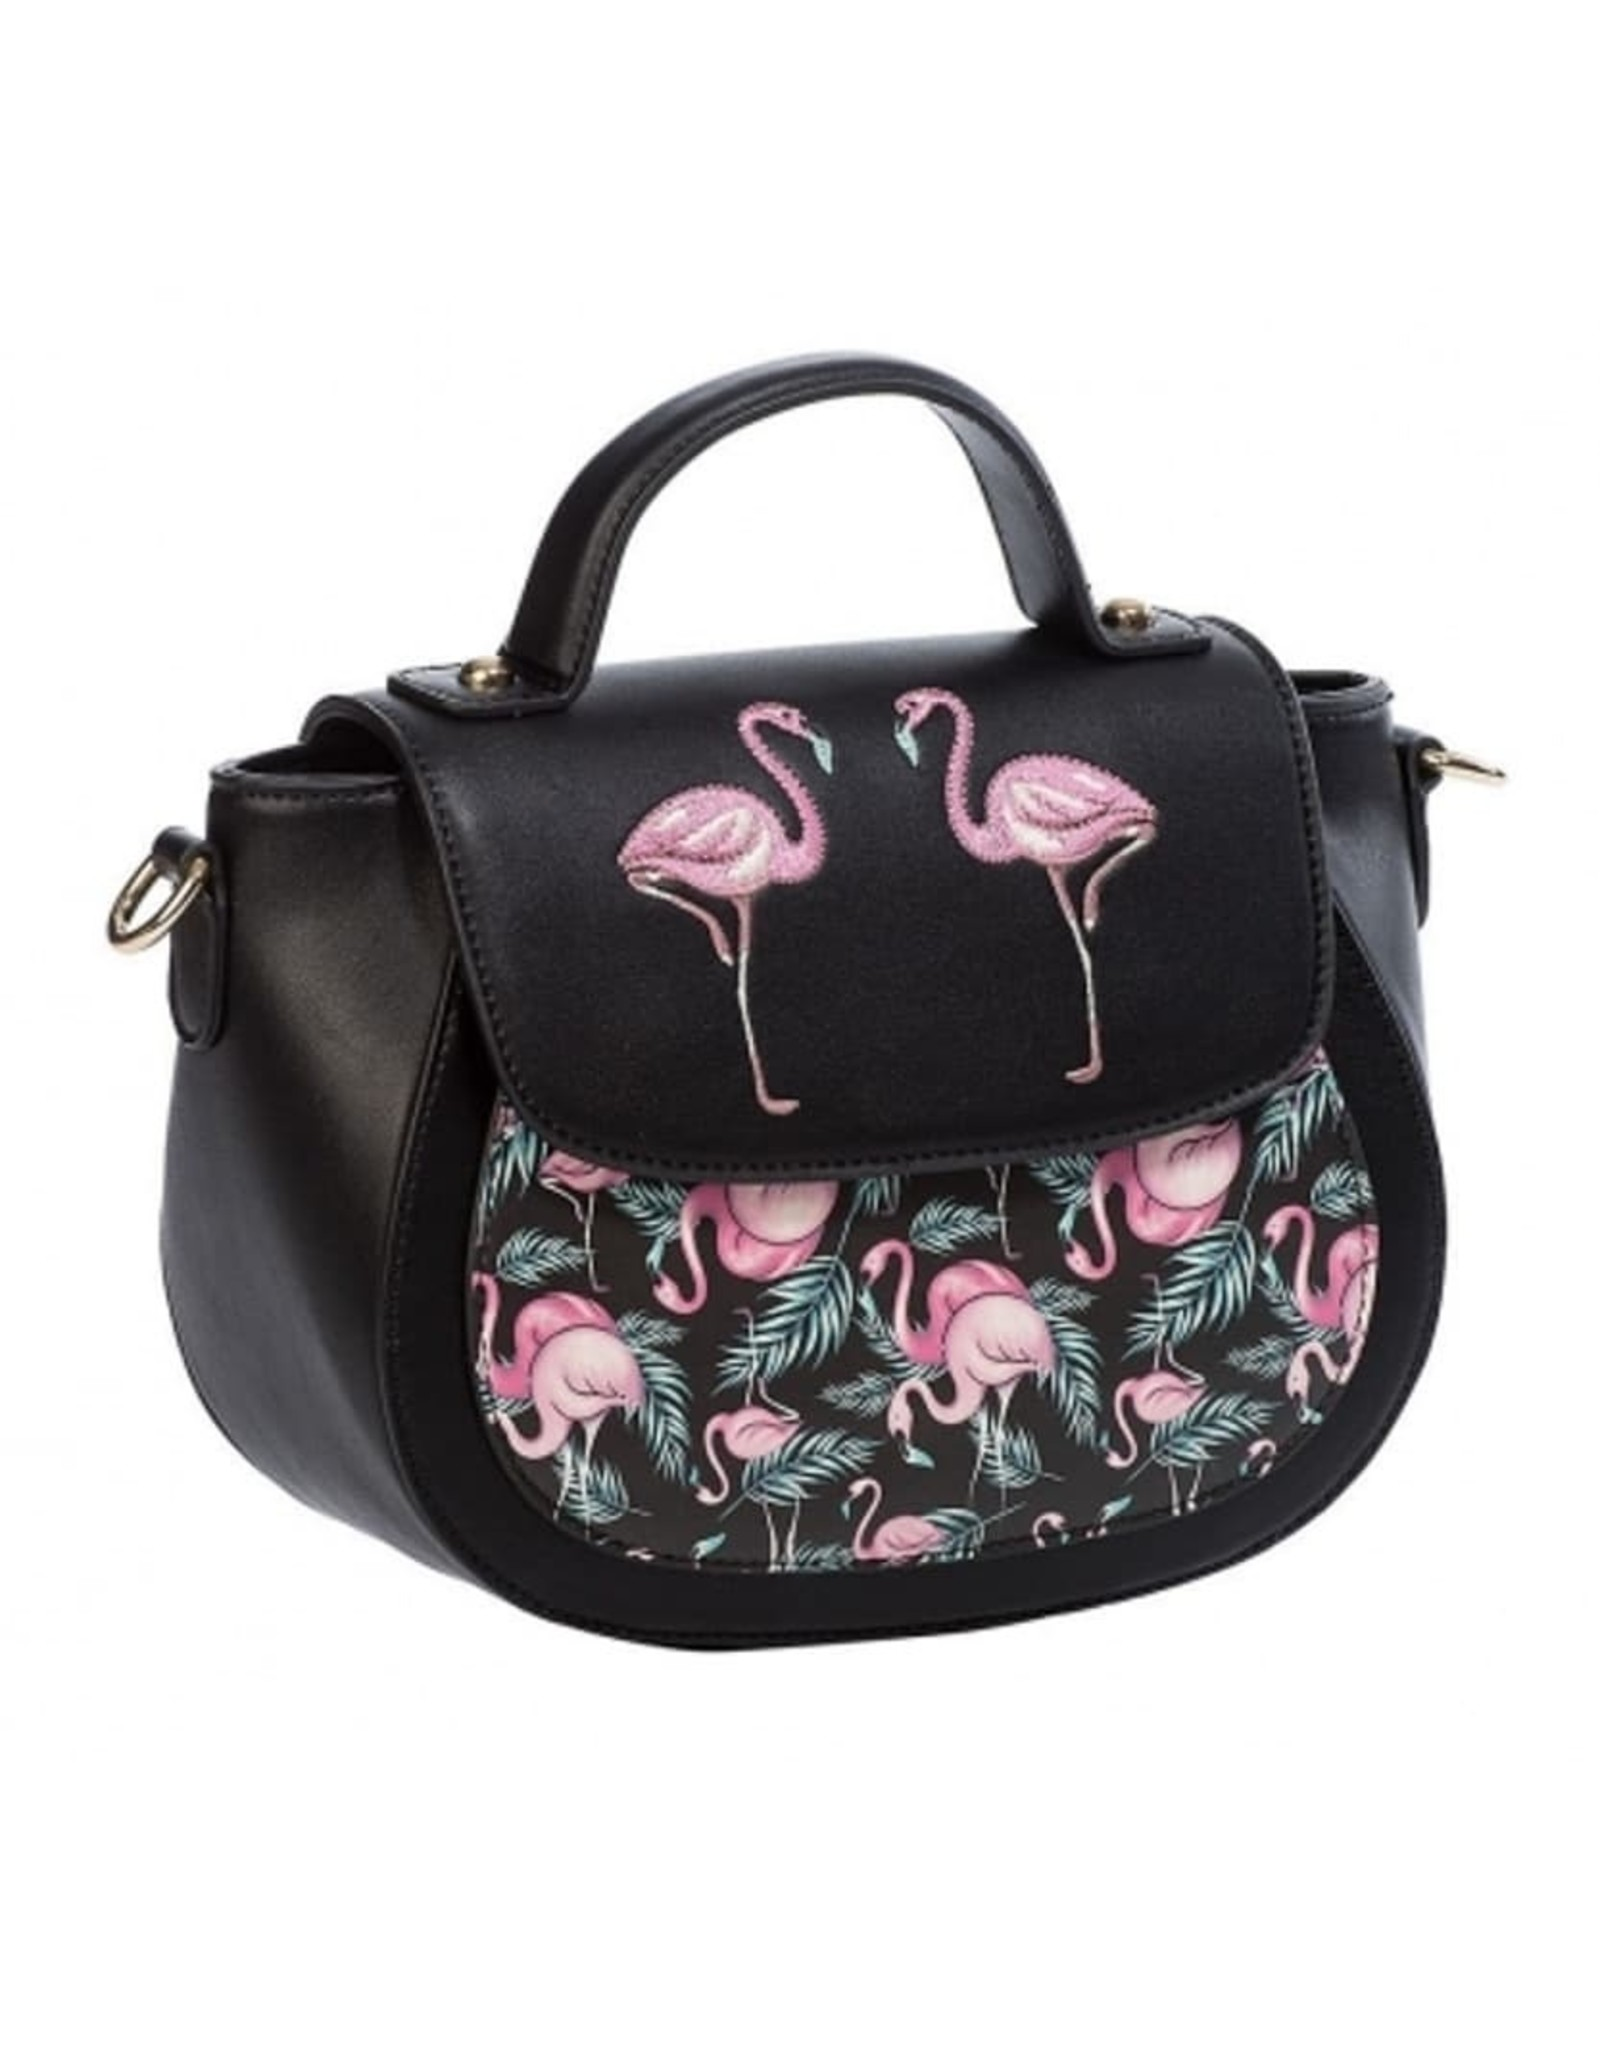 Vintage Retro tassen Vintage tassen - Banned Retro schoudertas met Flamingo's Malibu